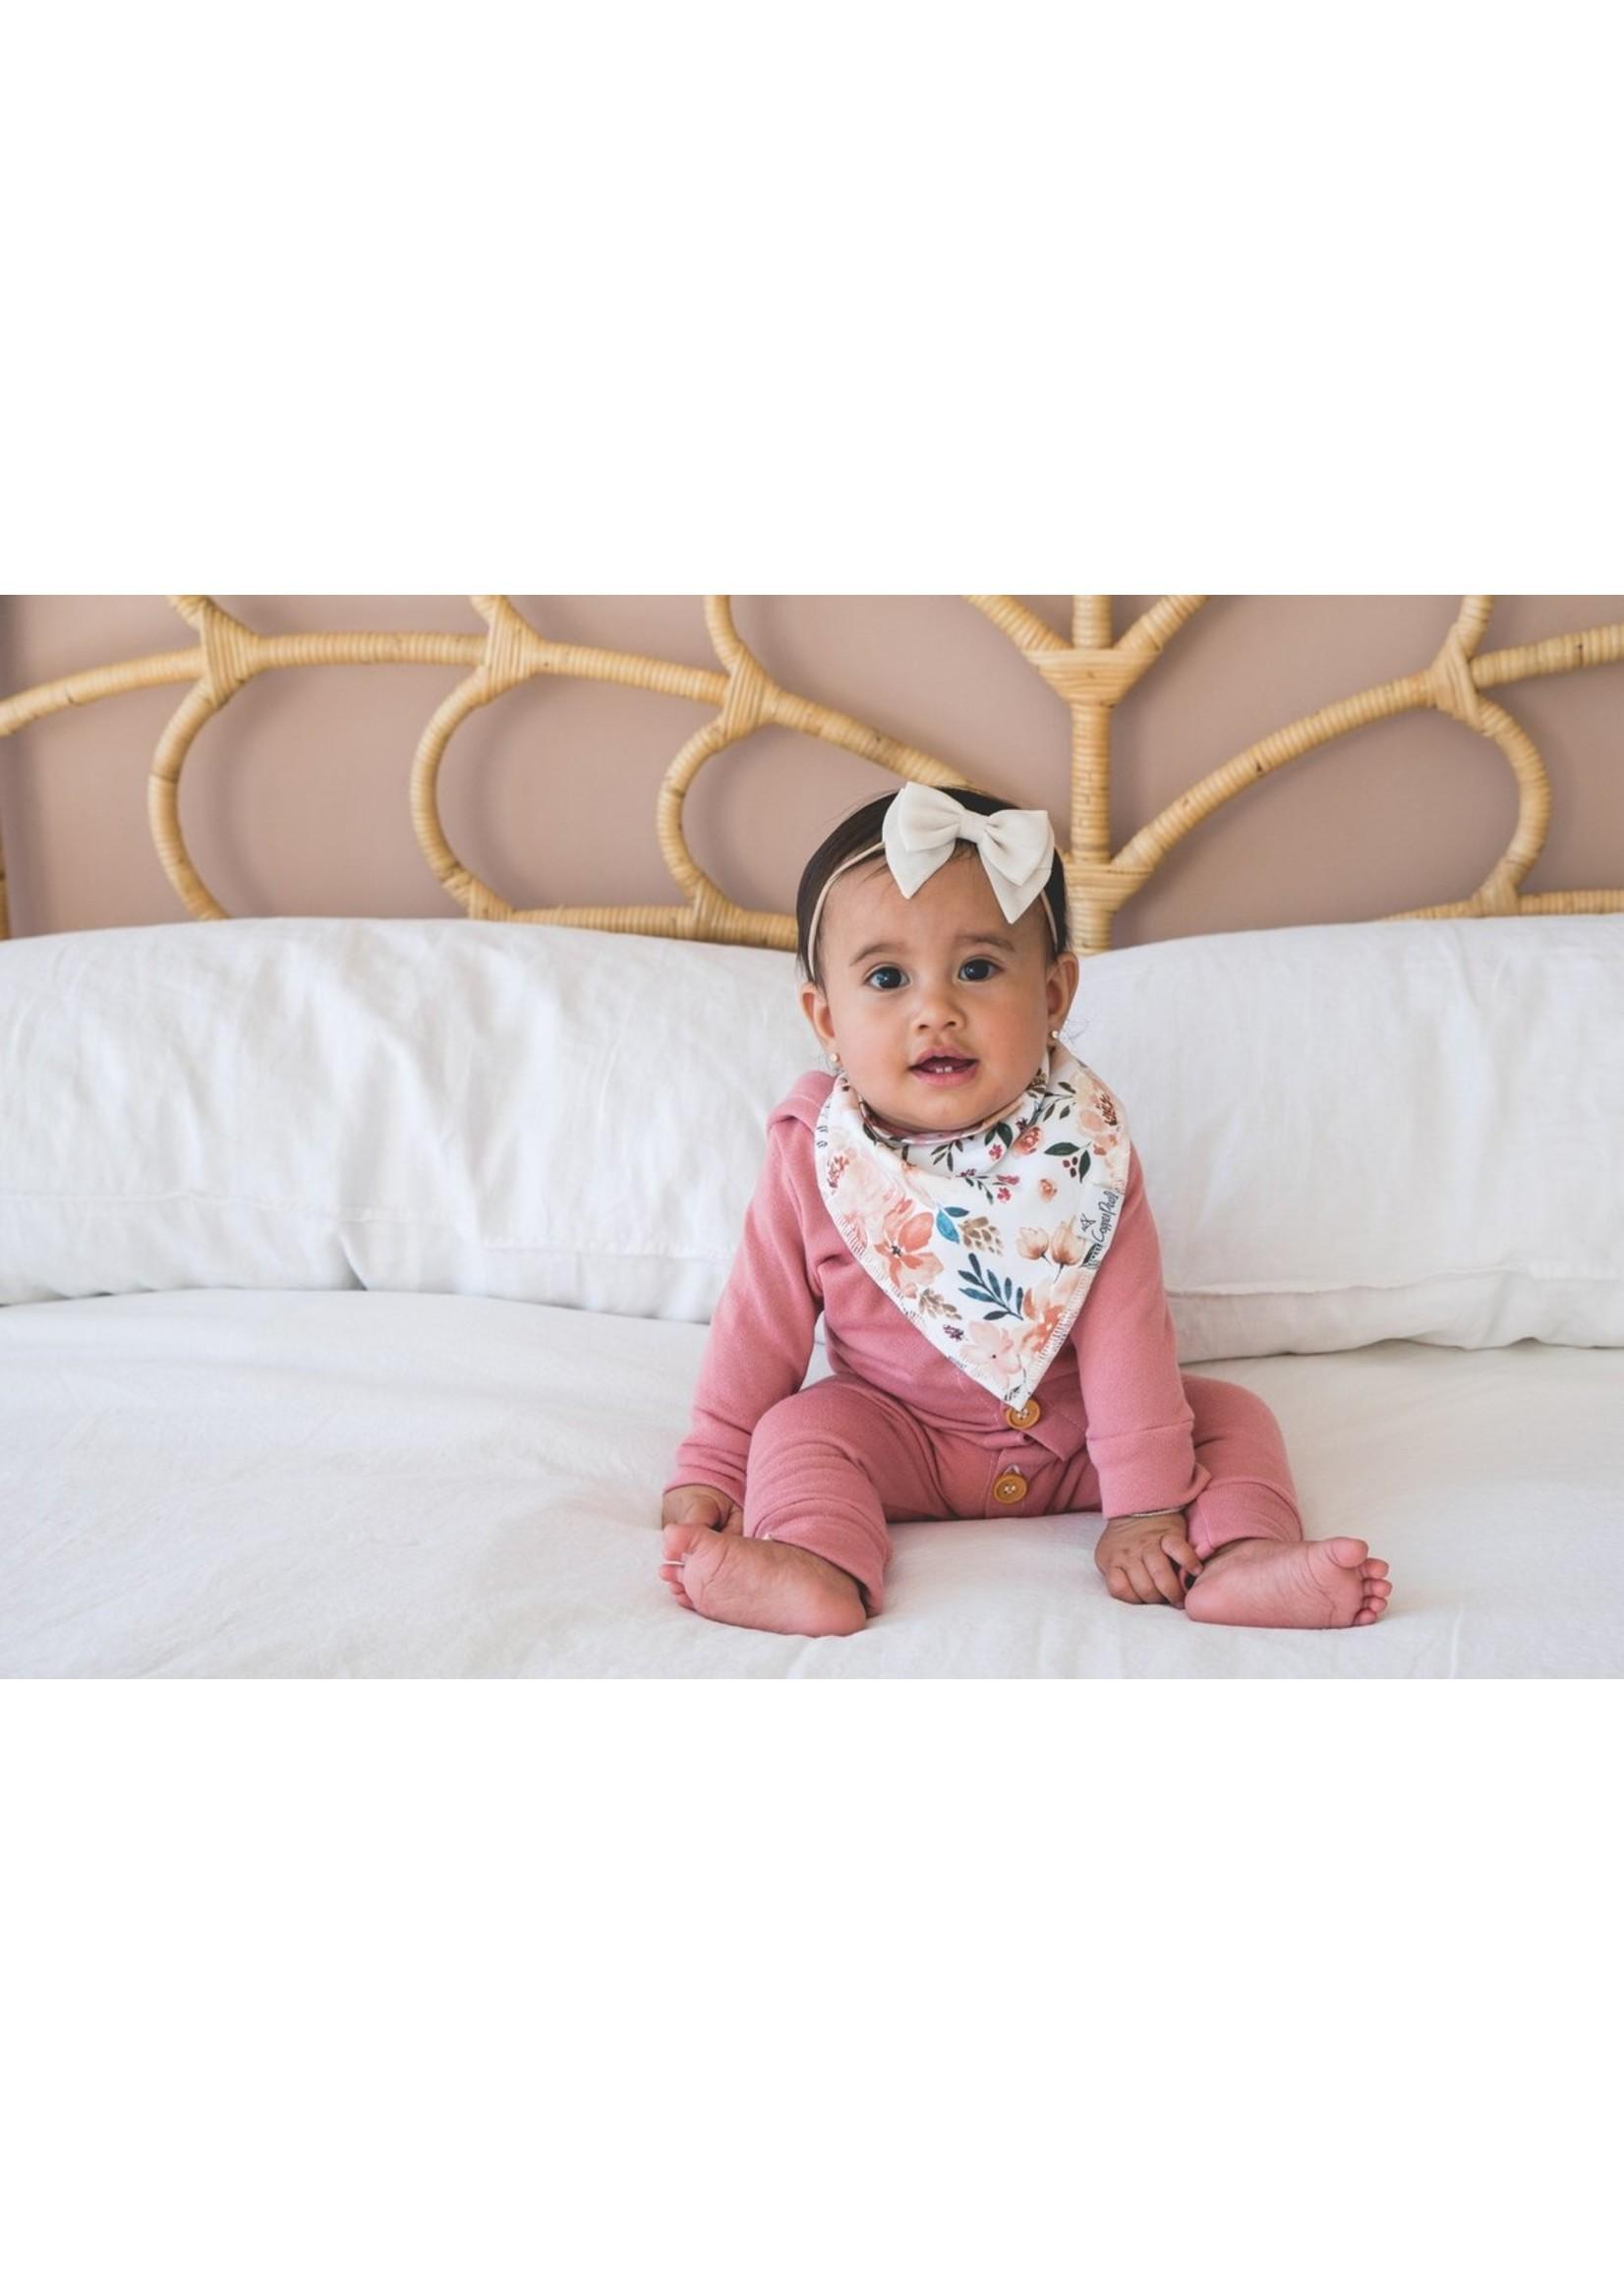 Copper pearl Baby Bandana Bibs - Autumn